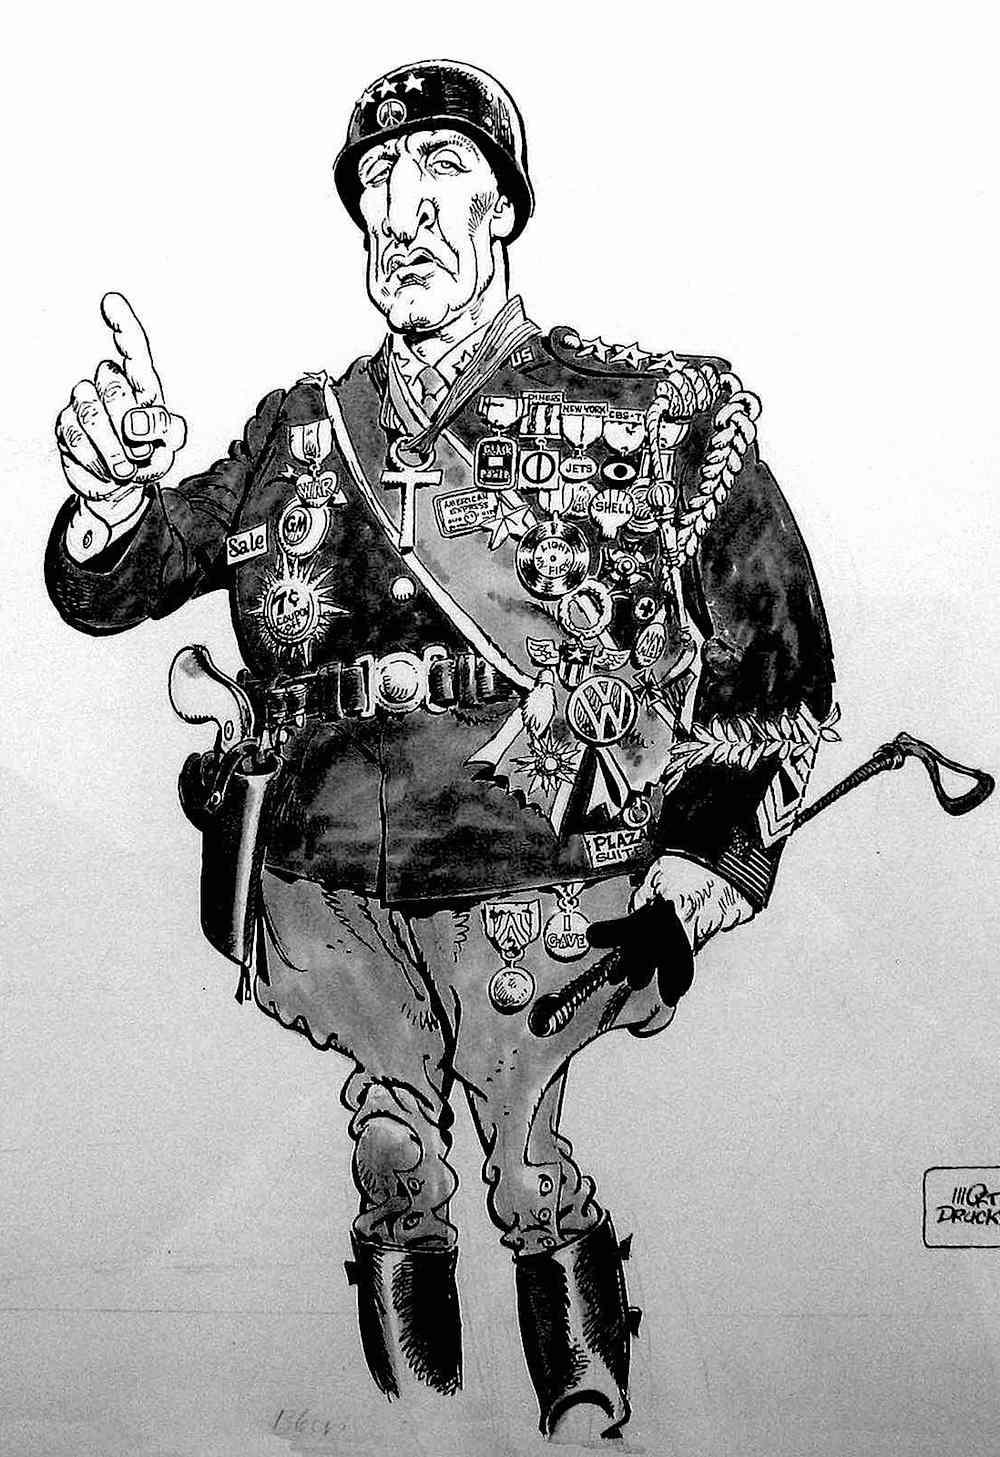 A cartoon of MAD magazine's General Patton by Mort Drucker, George C. Scott